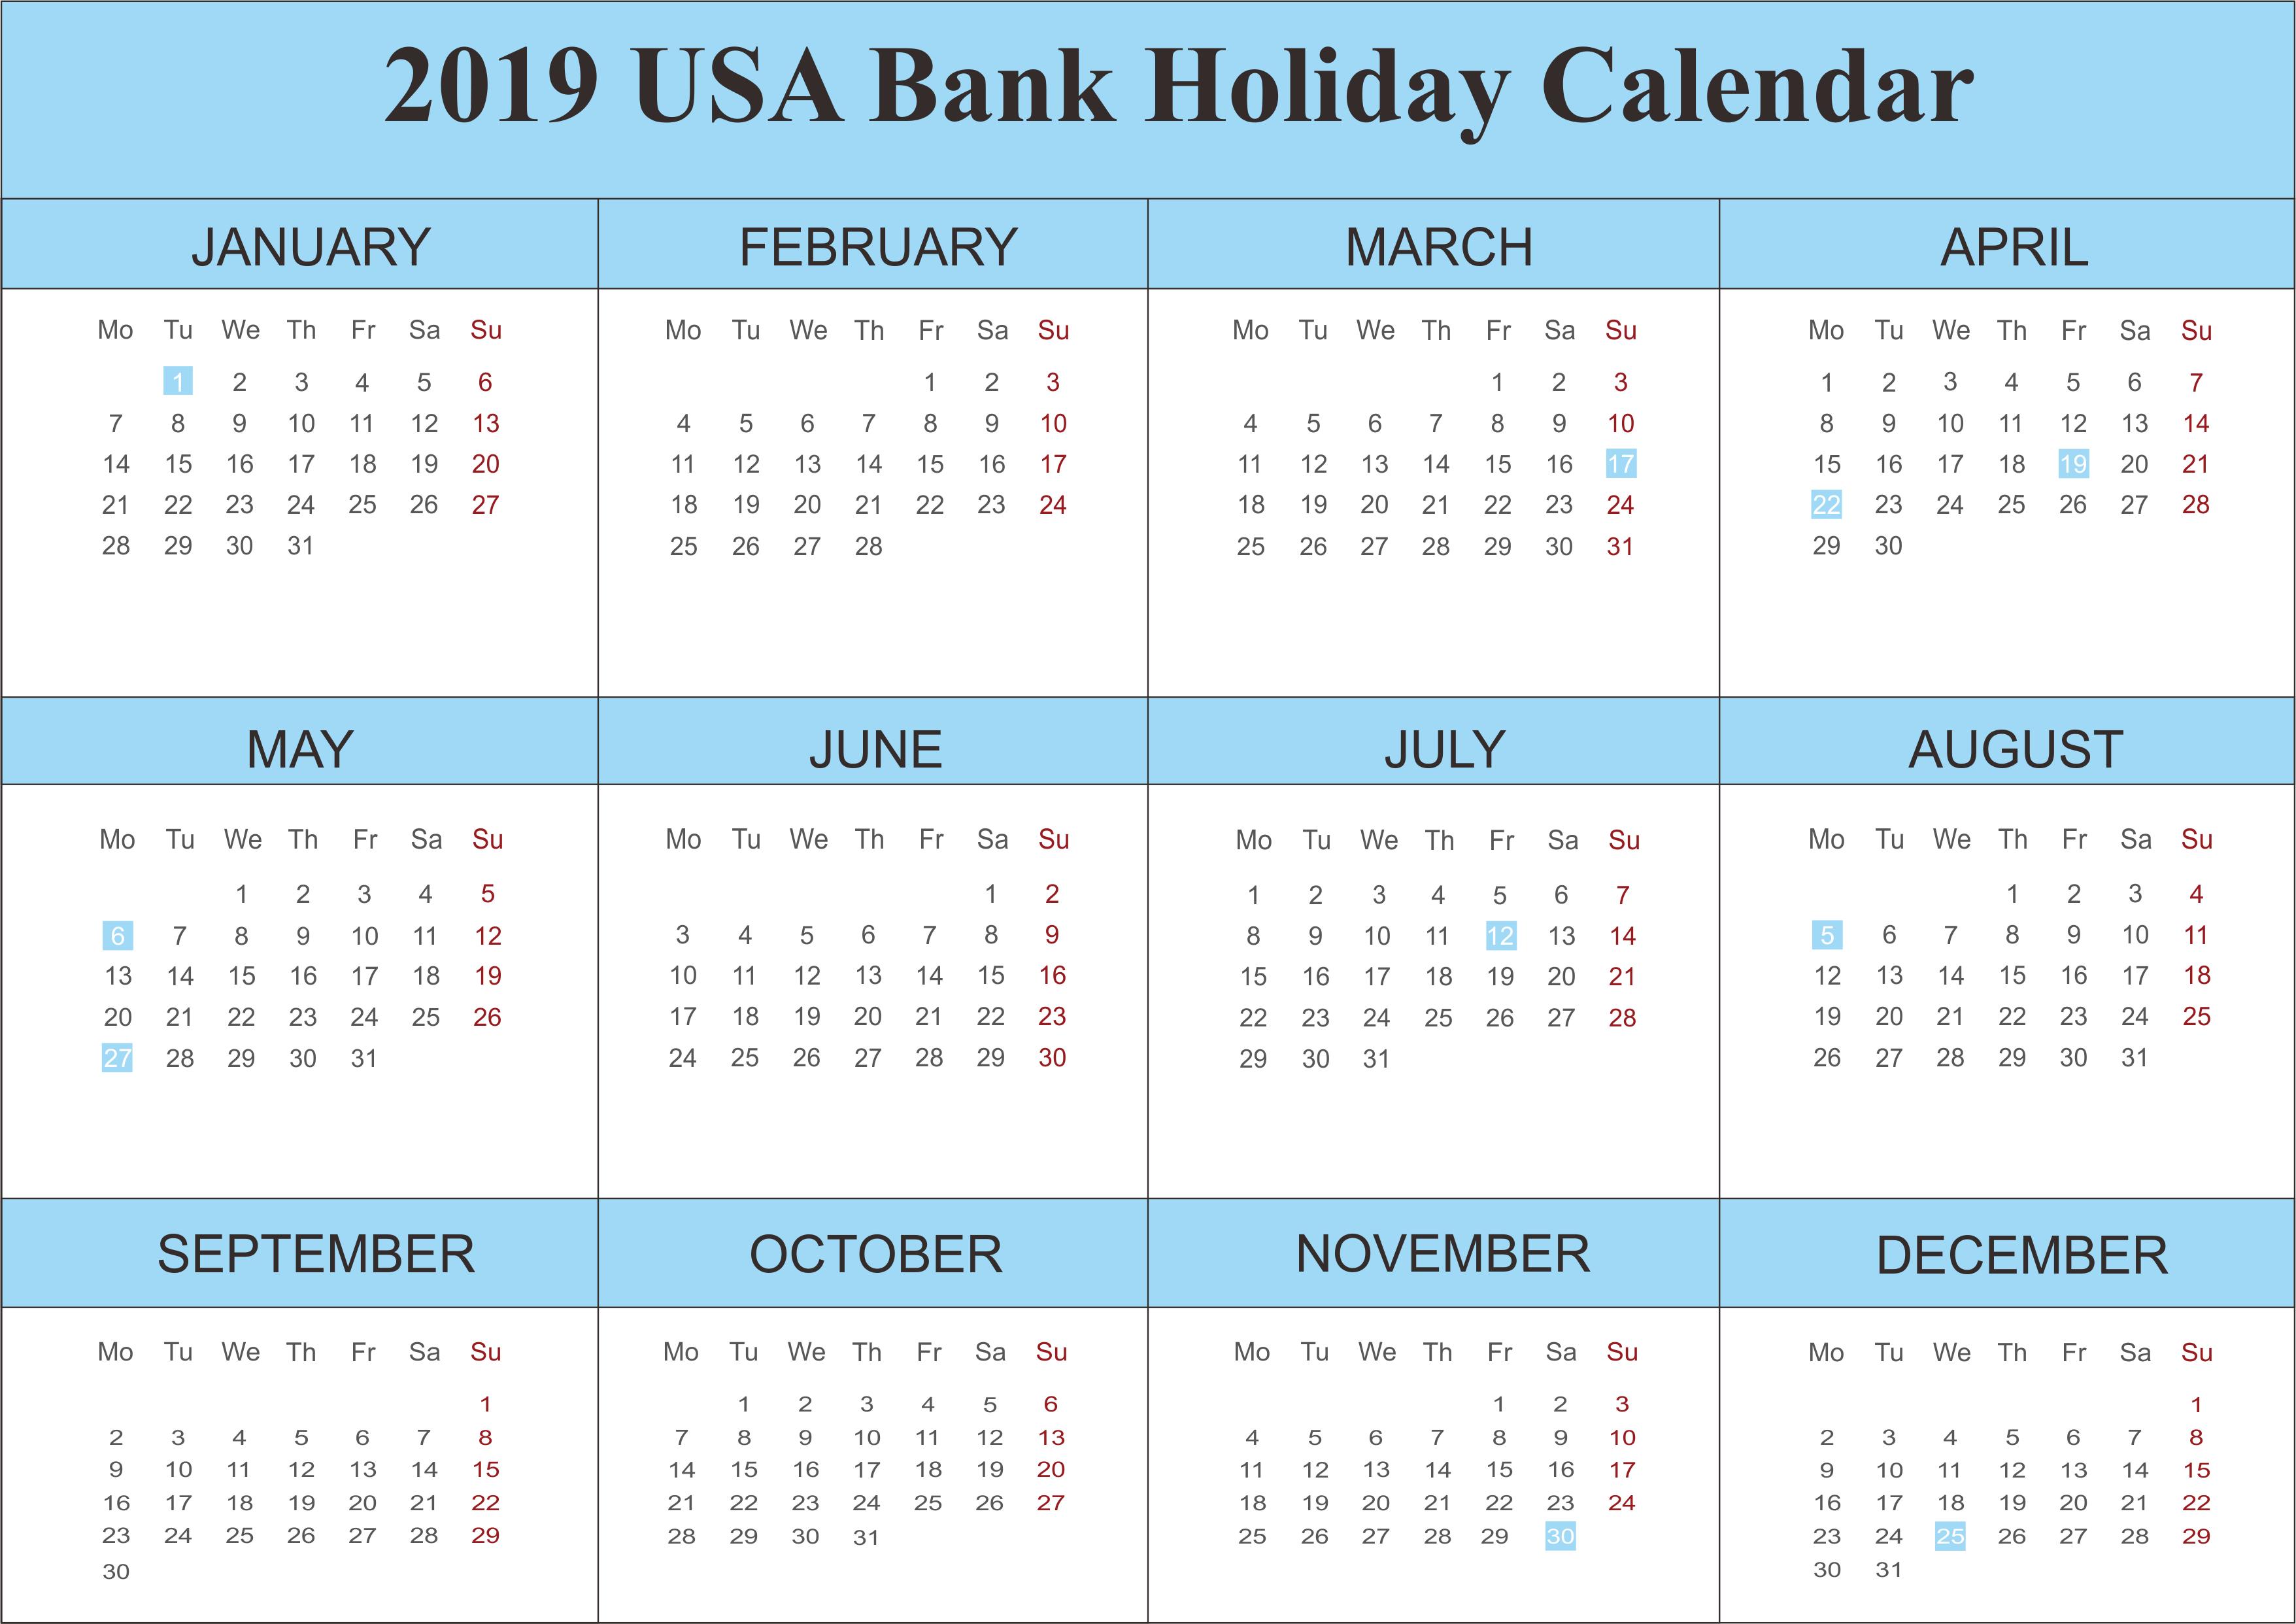 2019 USA Bank Holidays Calendar Holiday calendar